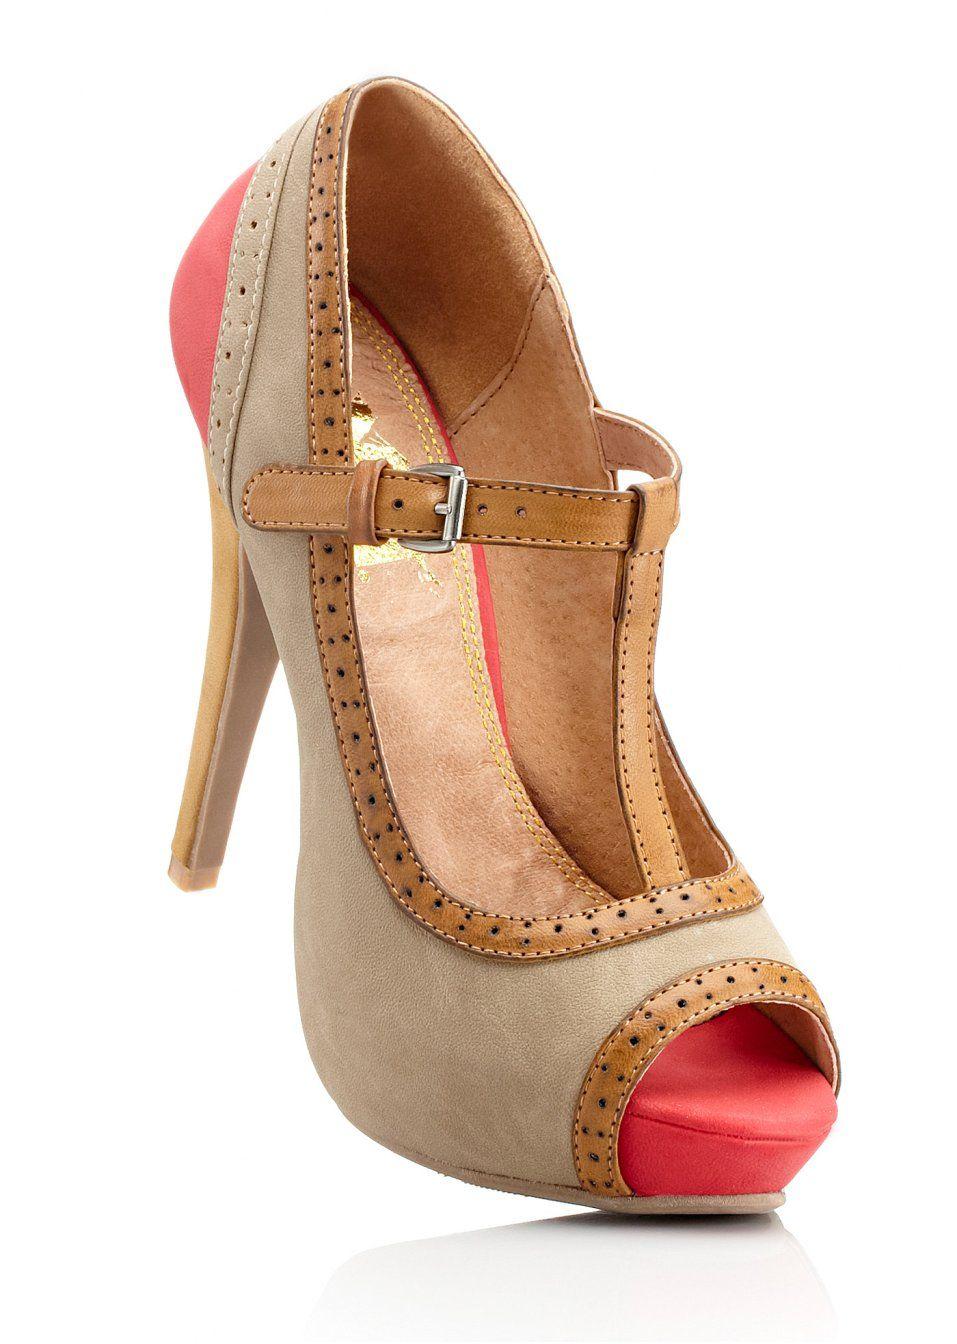 High High Schuhe heelsbonprixOutfits heelsbonprixOutfits SandalettenSüße I I 9DEH2I